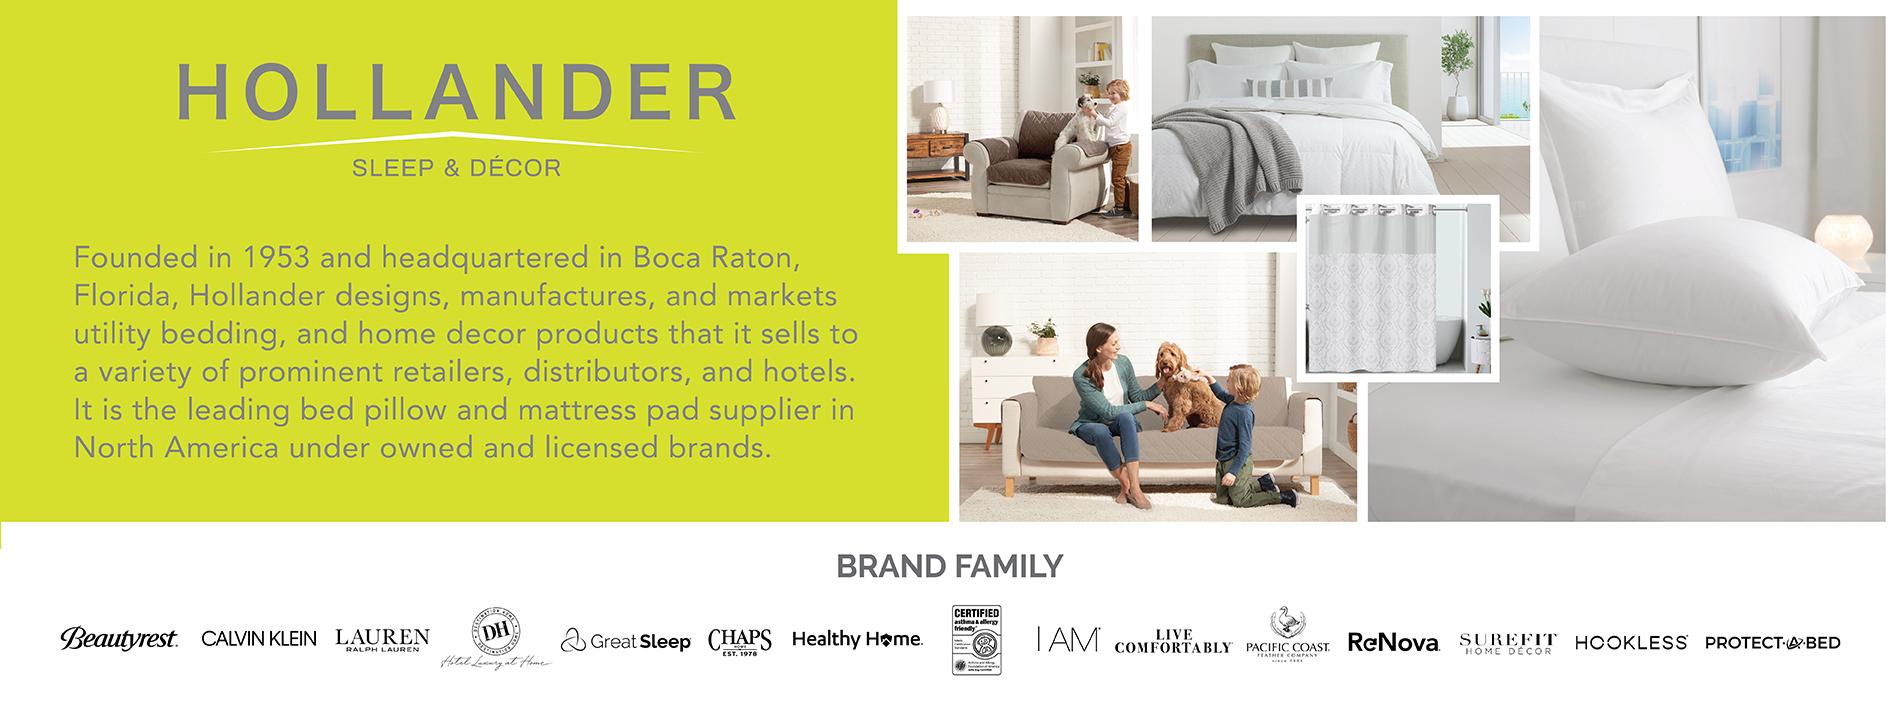 Hollander Sleep Products & Decor